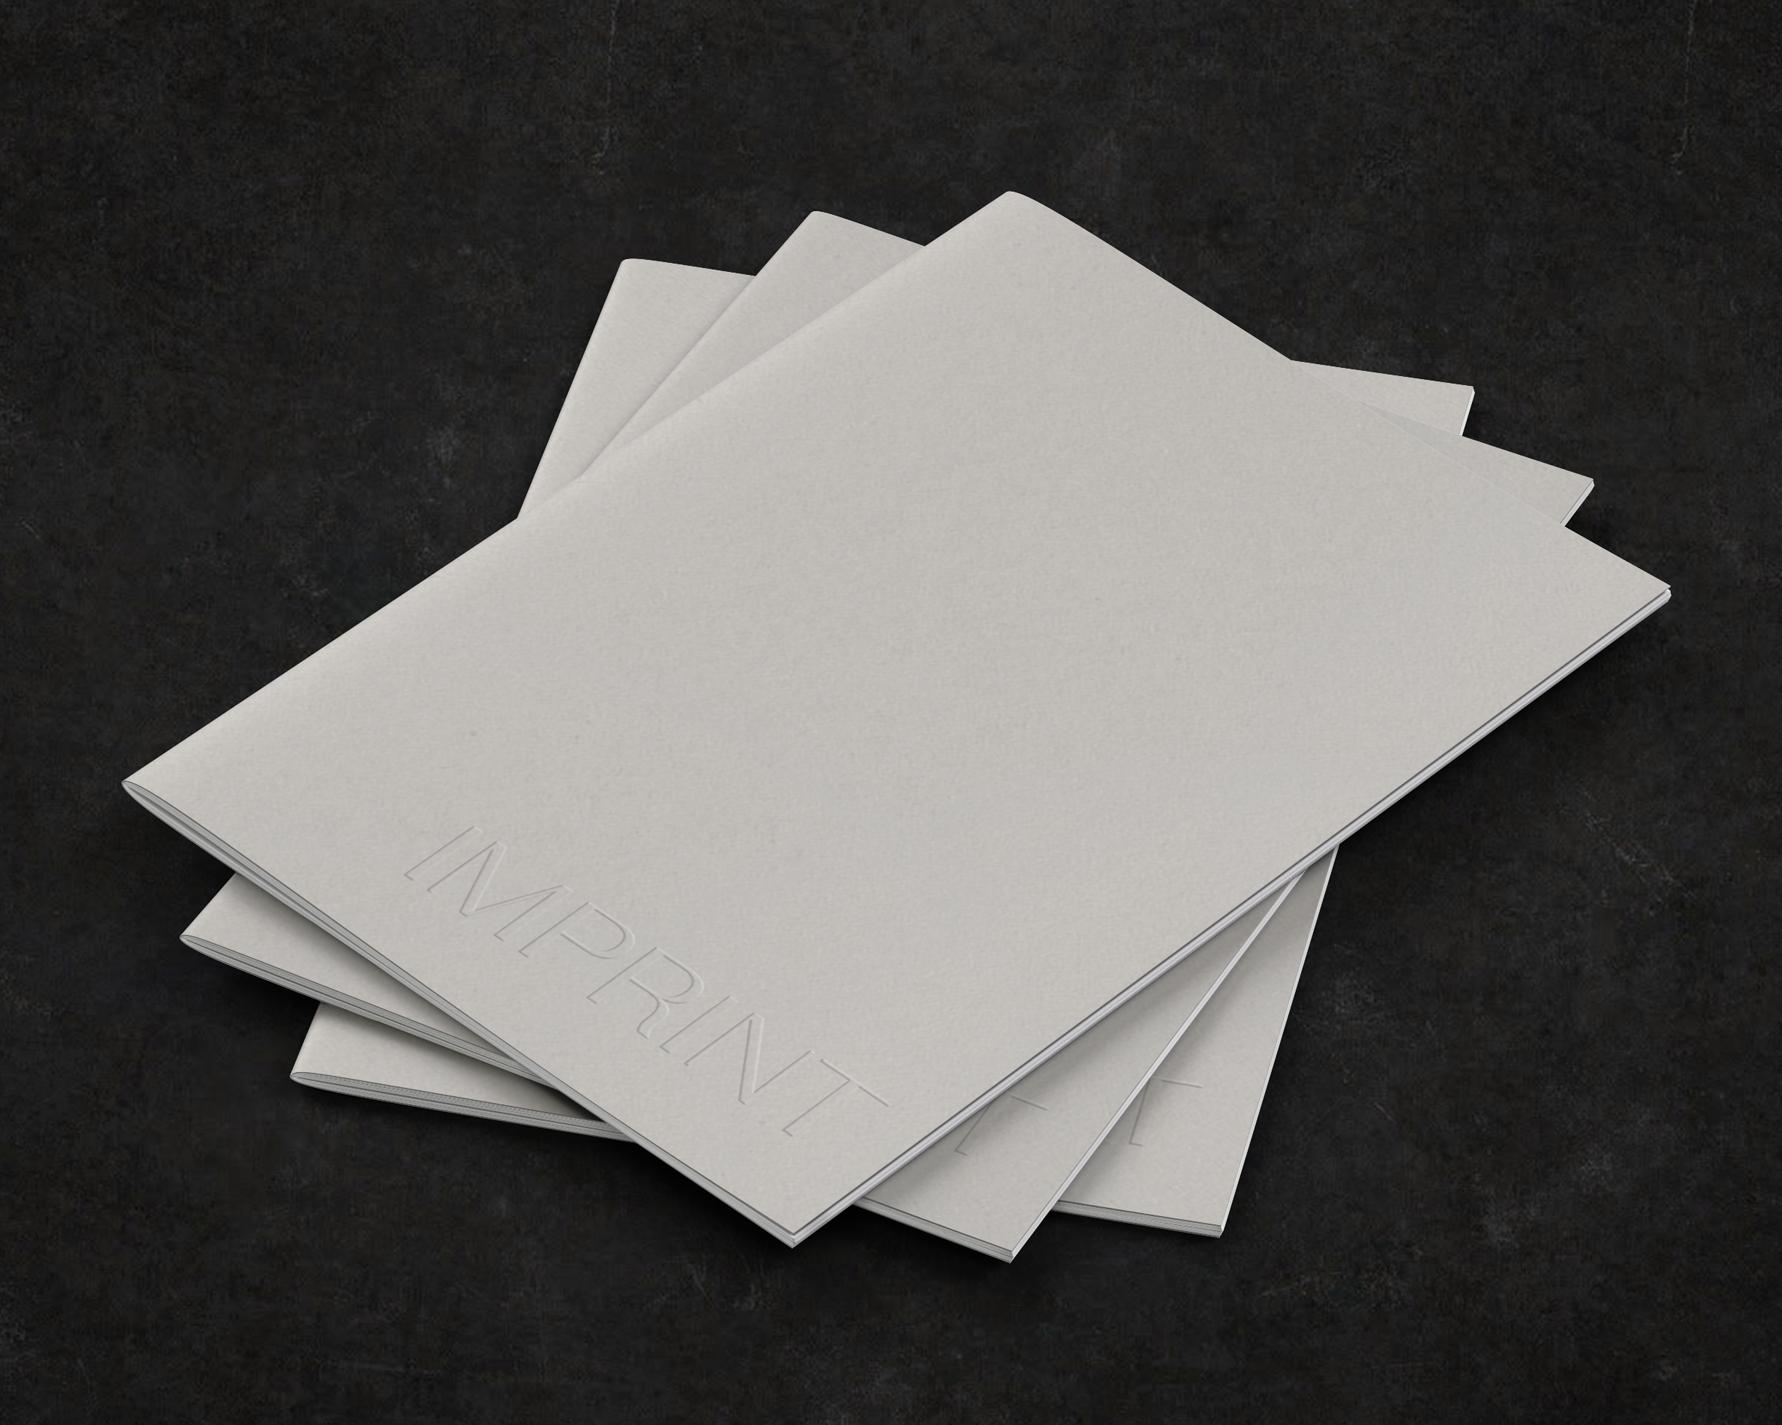 Imprint_5_BrochureCover-1